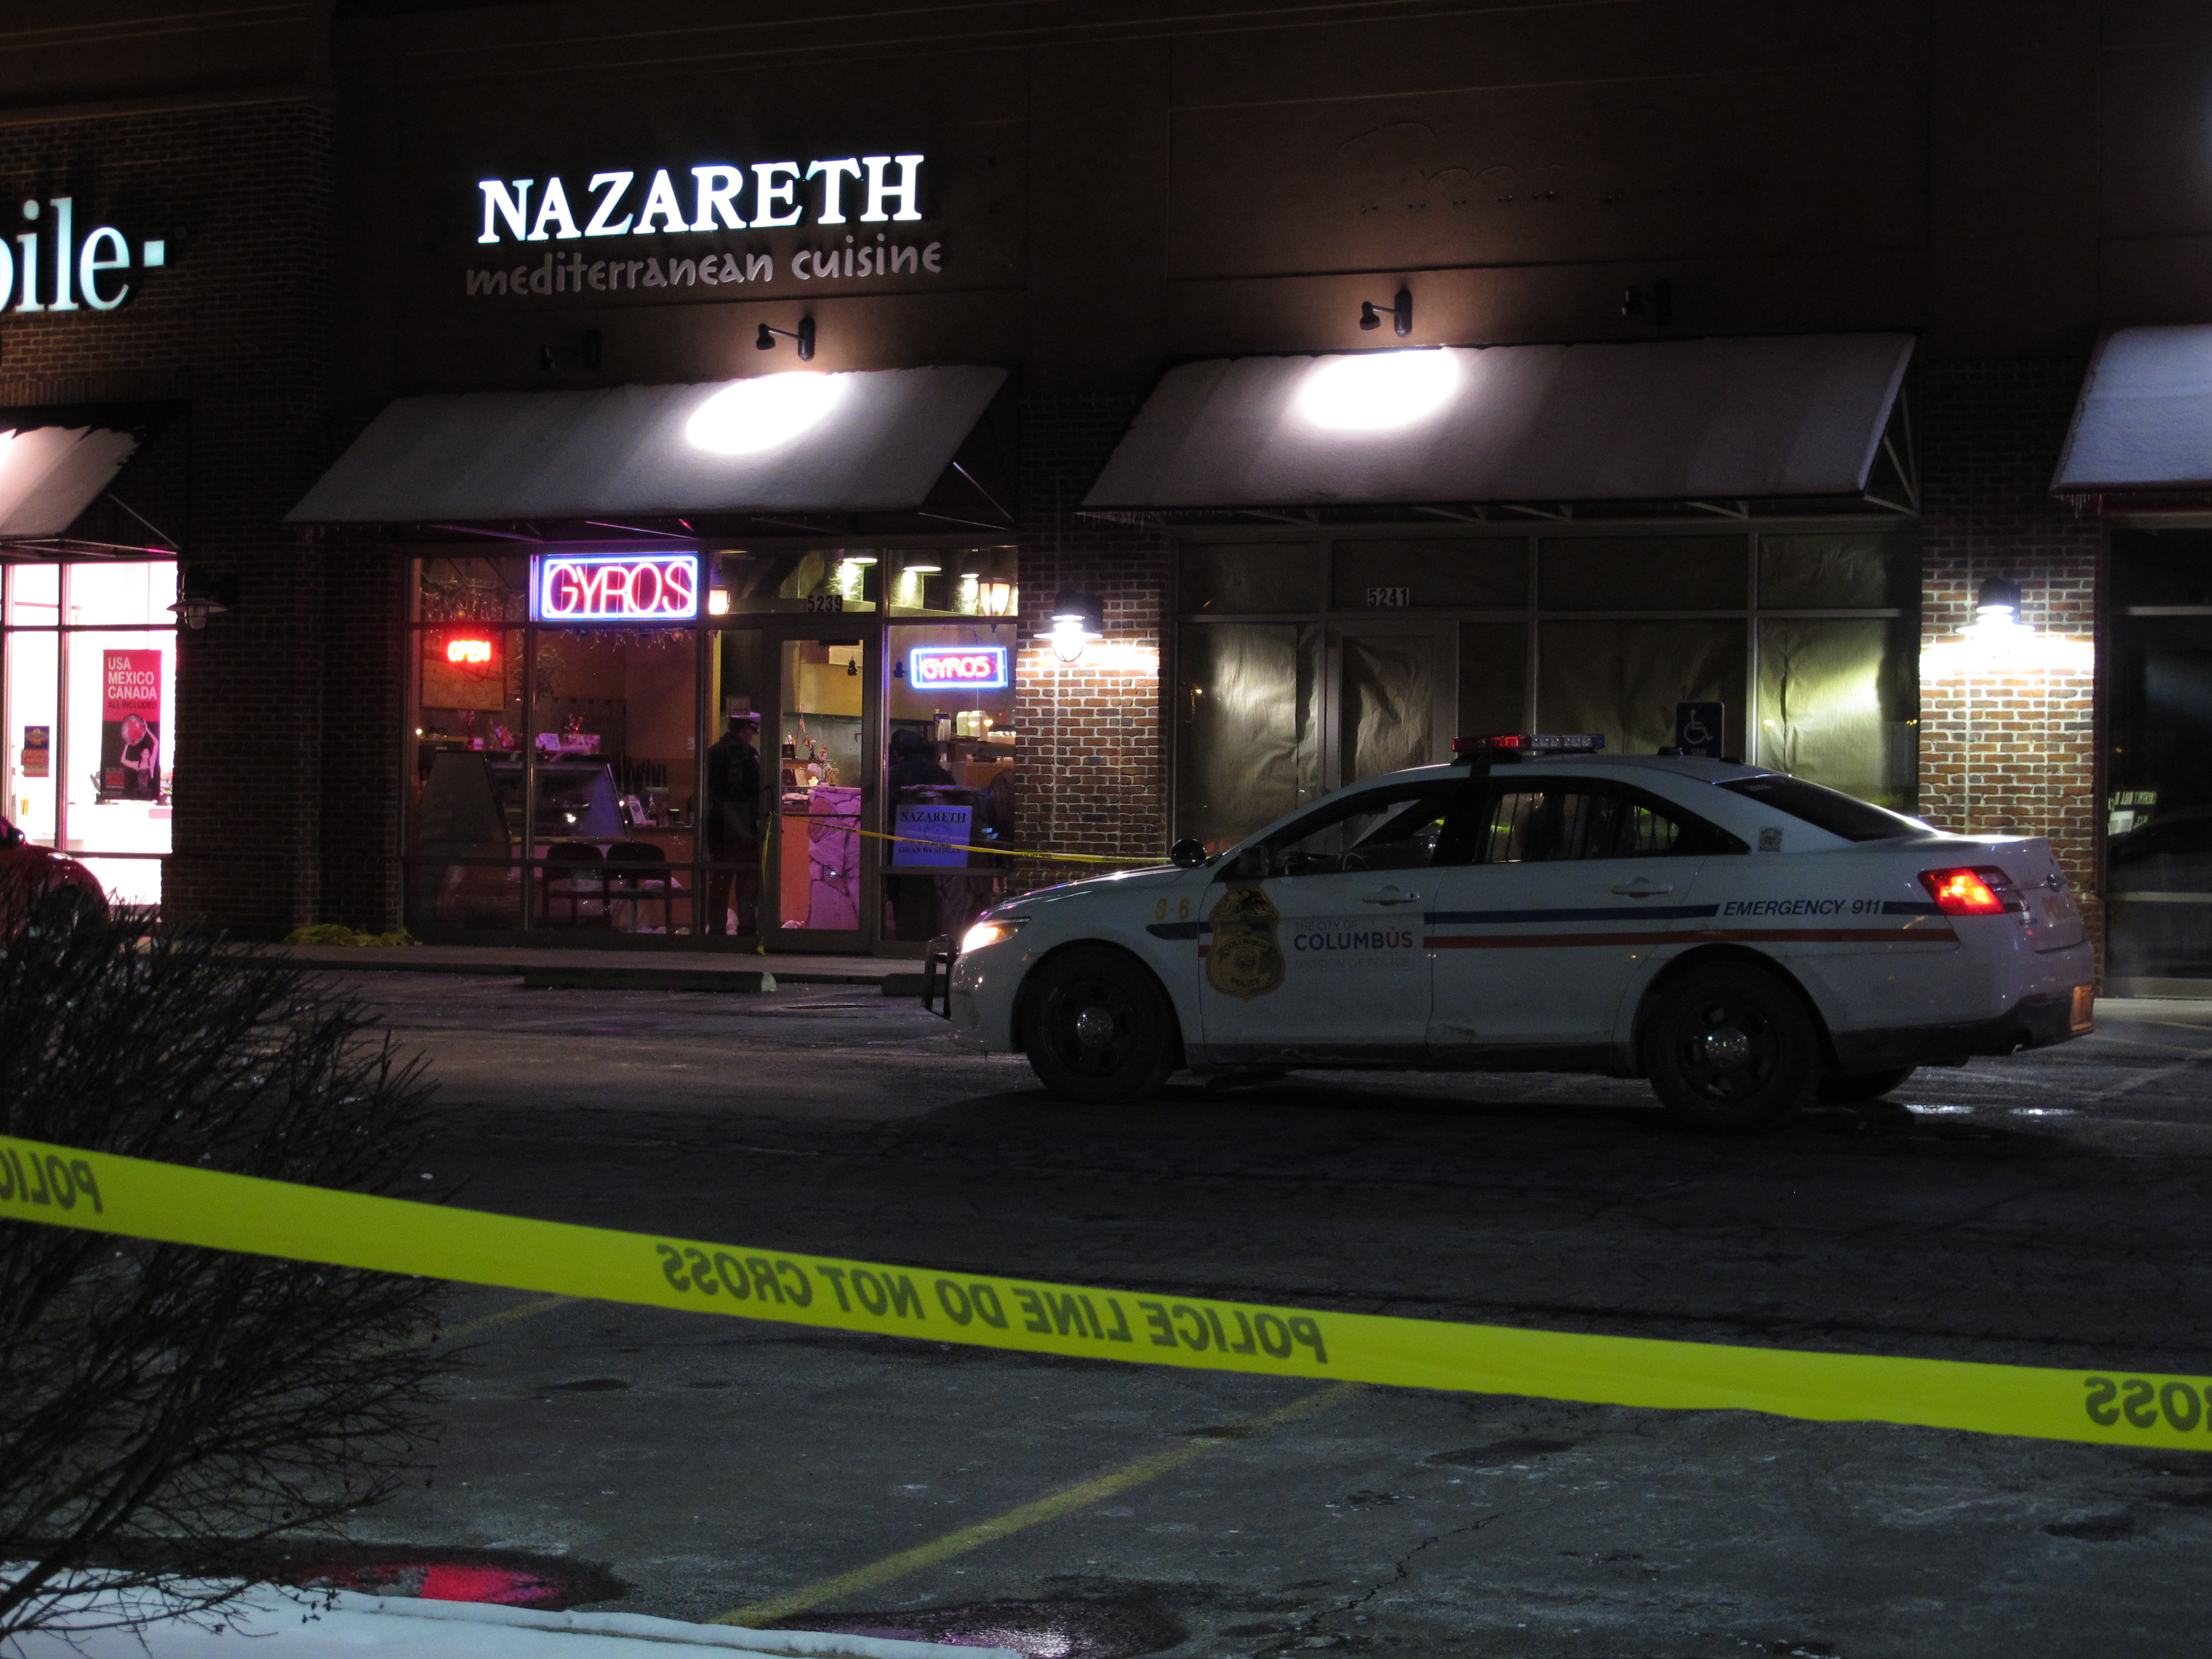 Where Is Nazareth Restaurant In Columbus Ohio